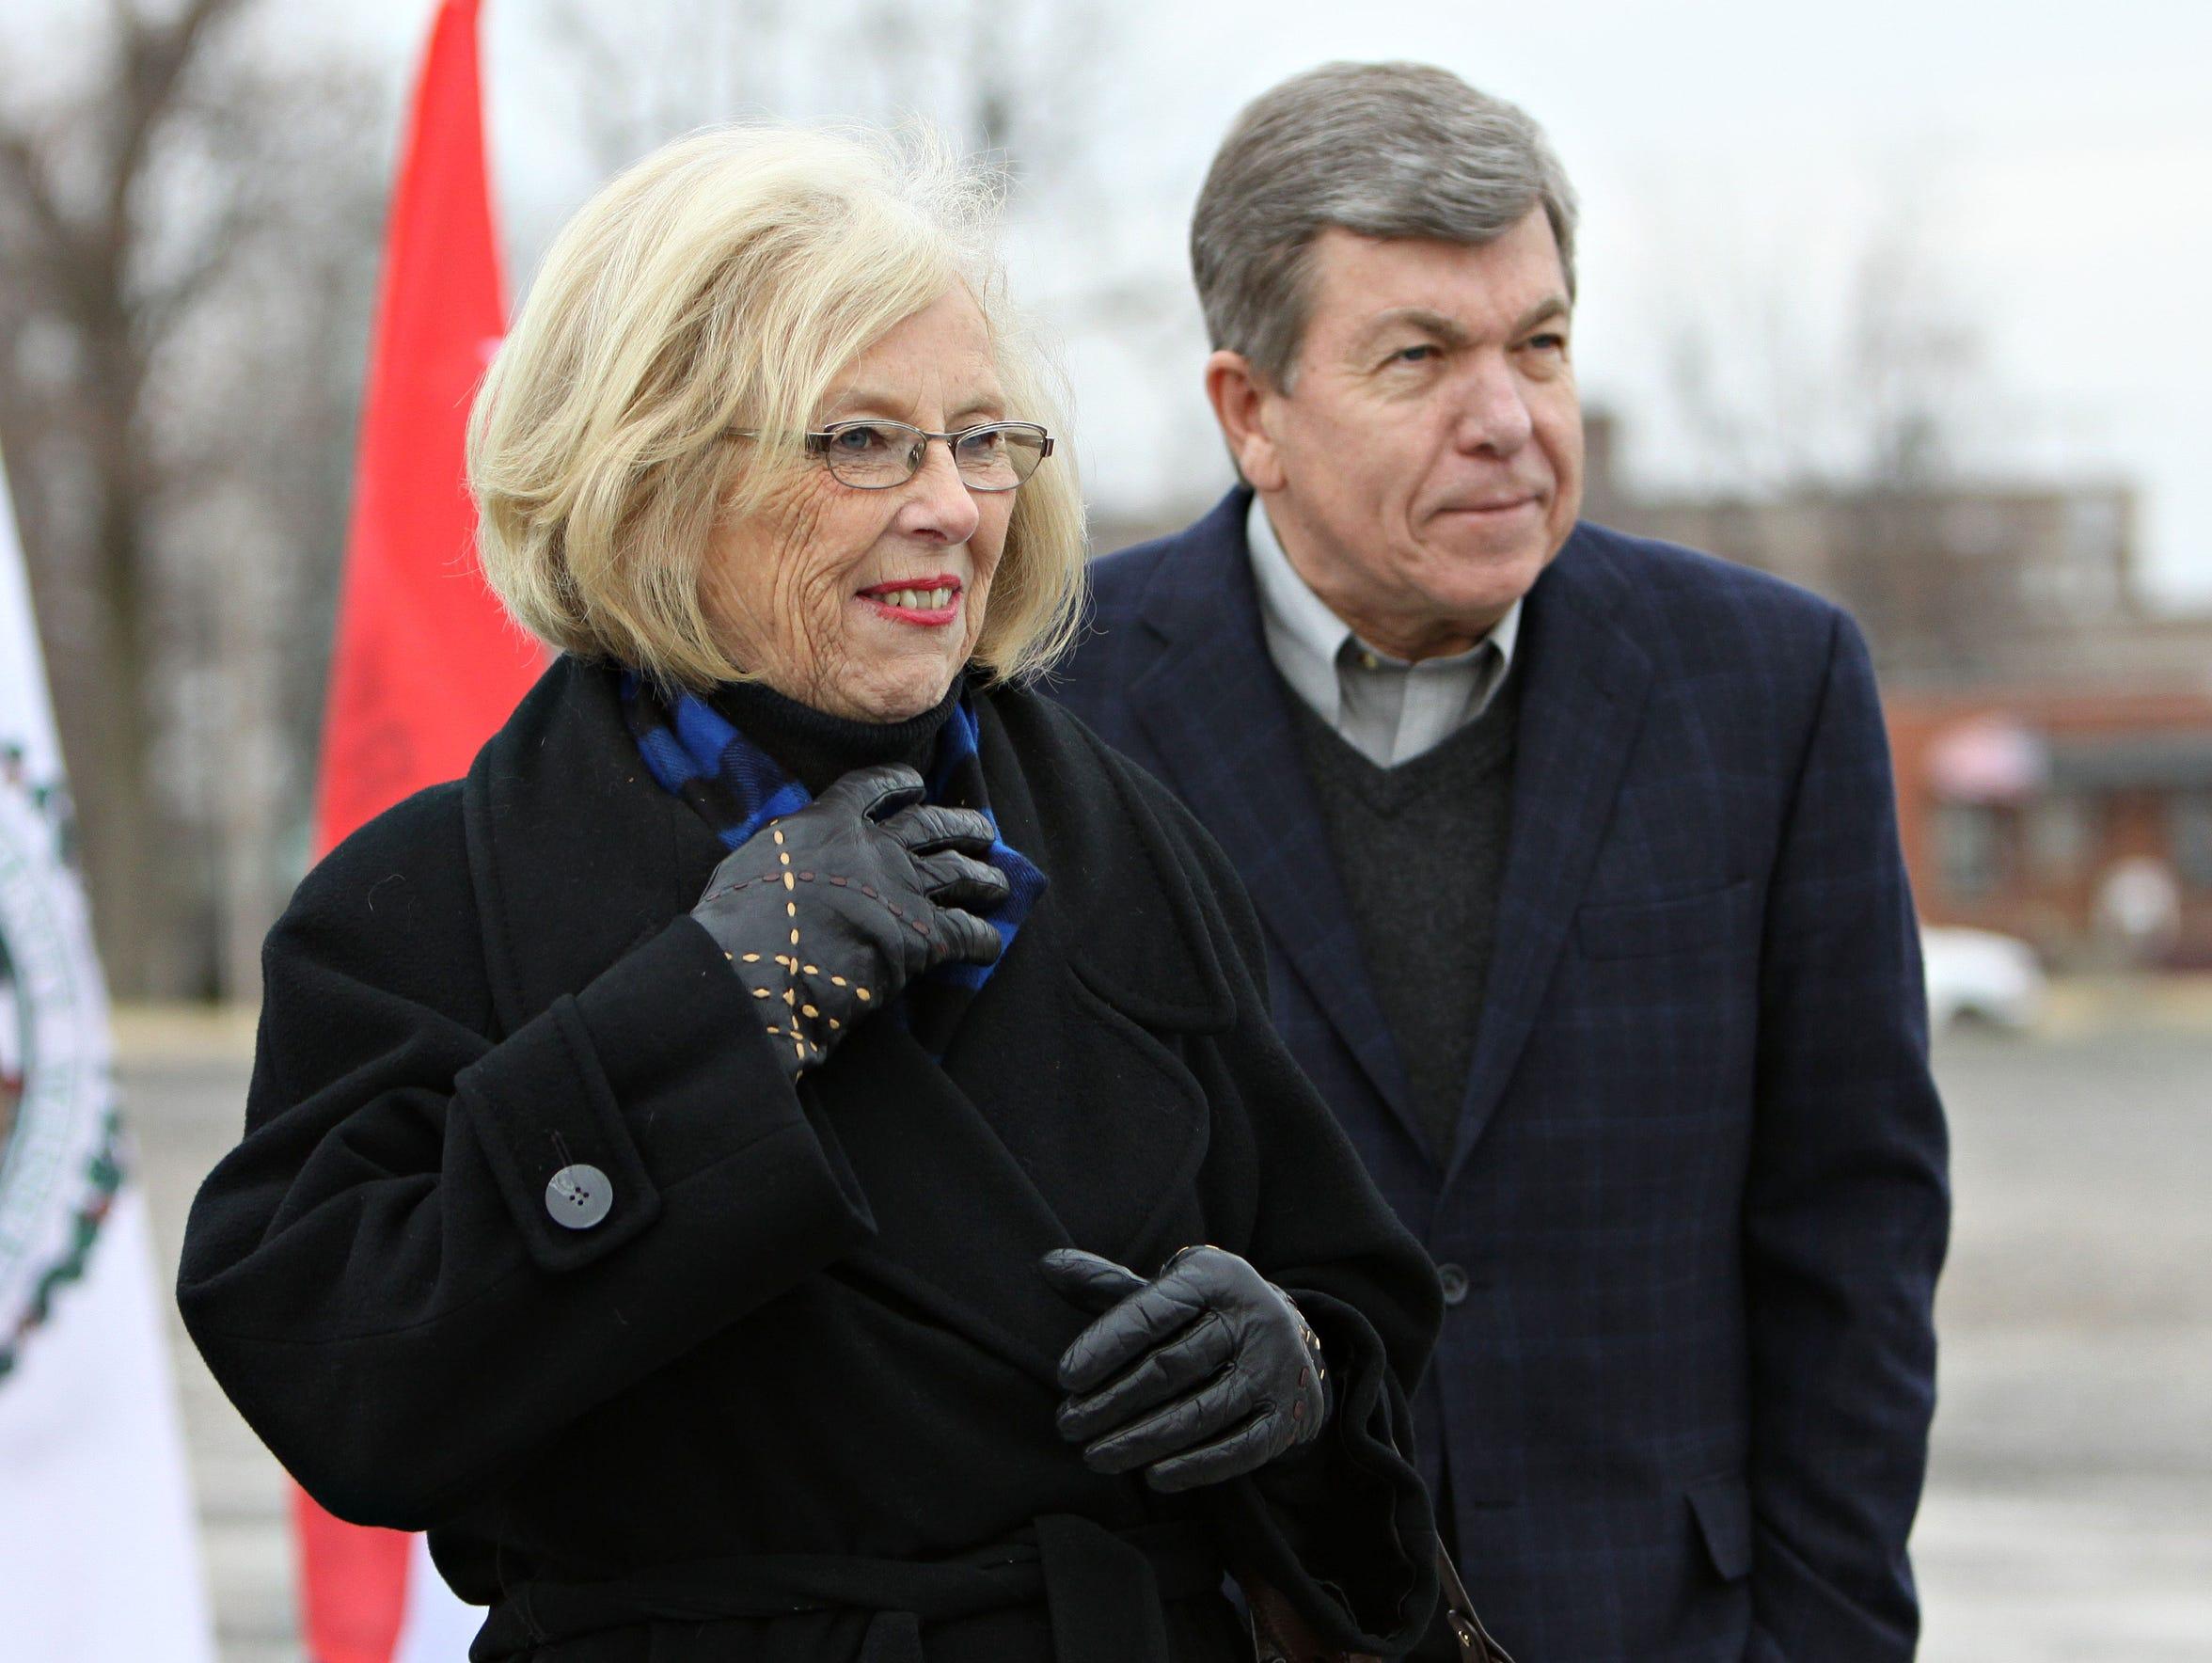 Greene County Commissioner Roseann Bentley and Senator